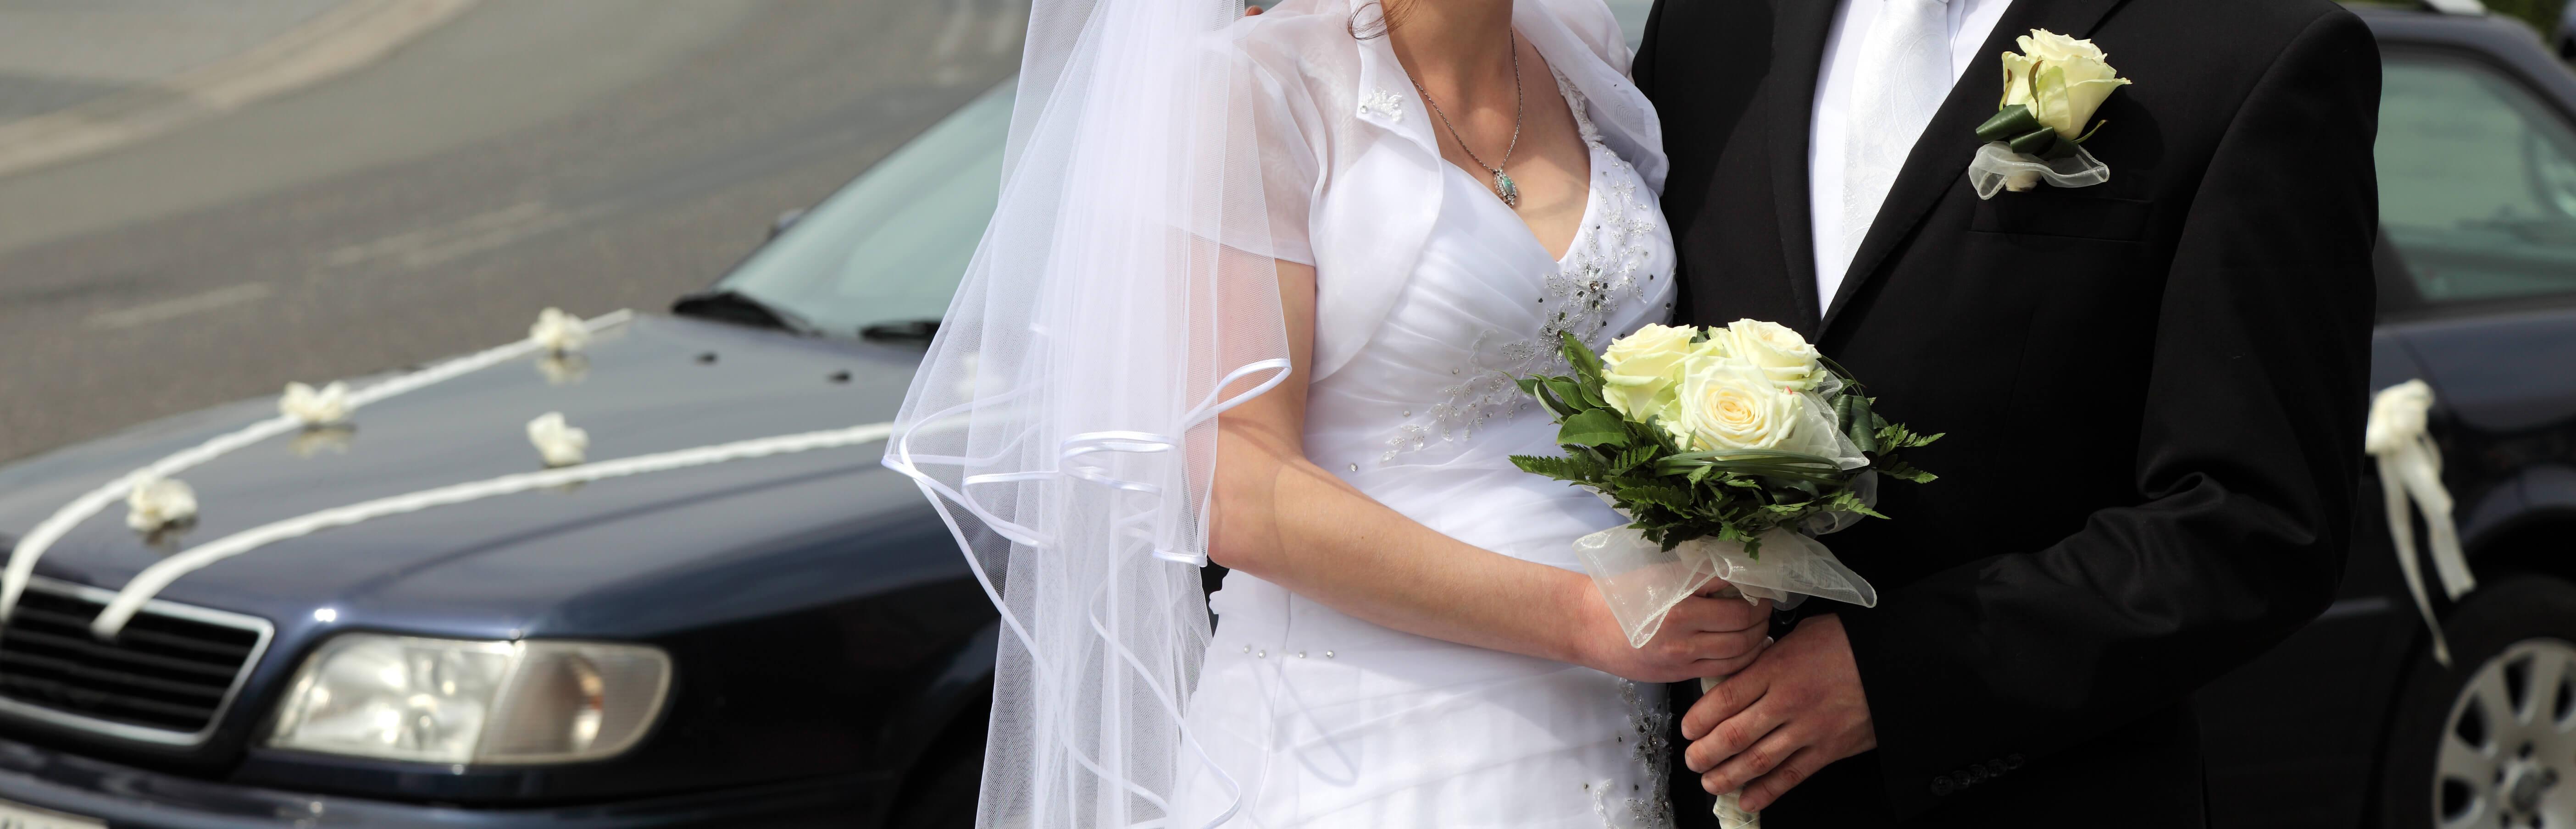 wedding chauffeur hire leeds